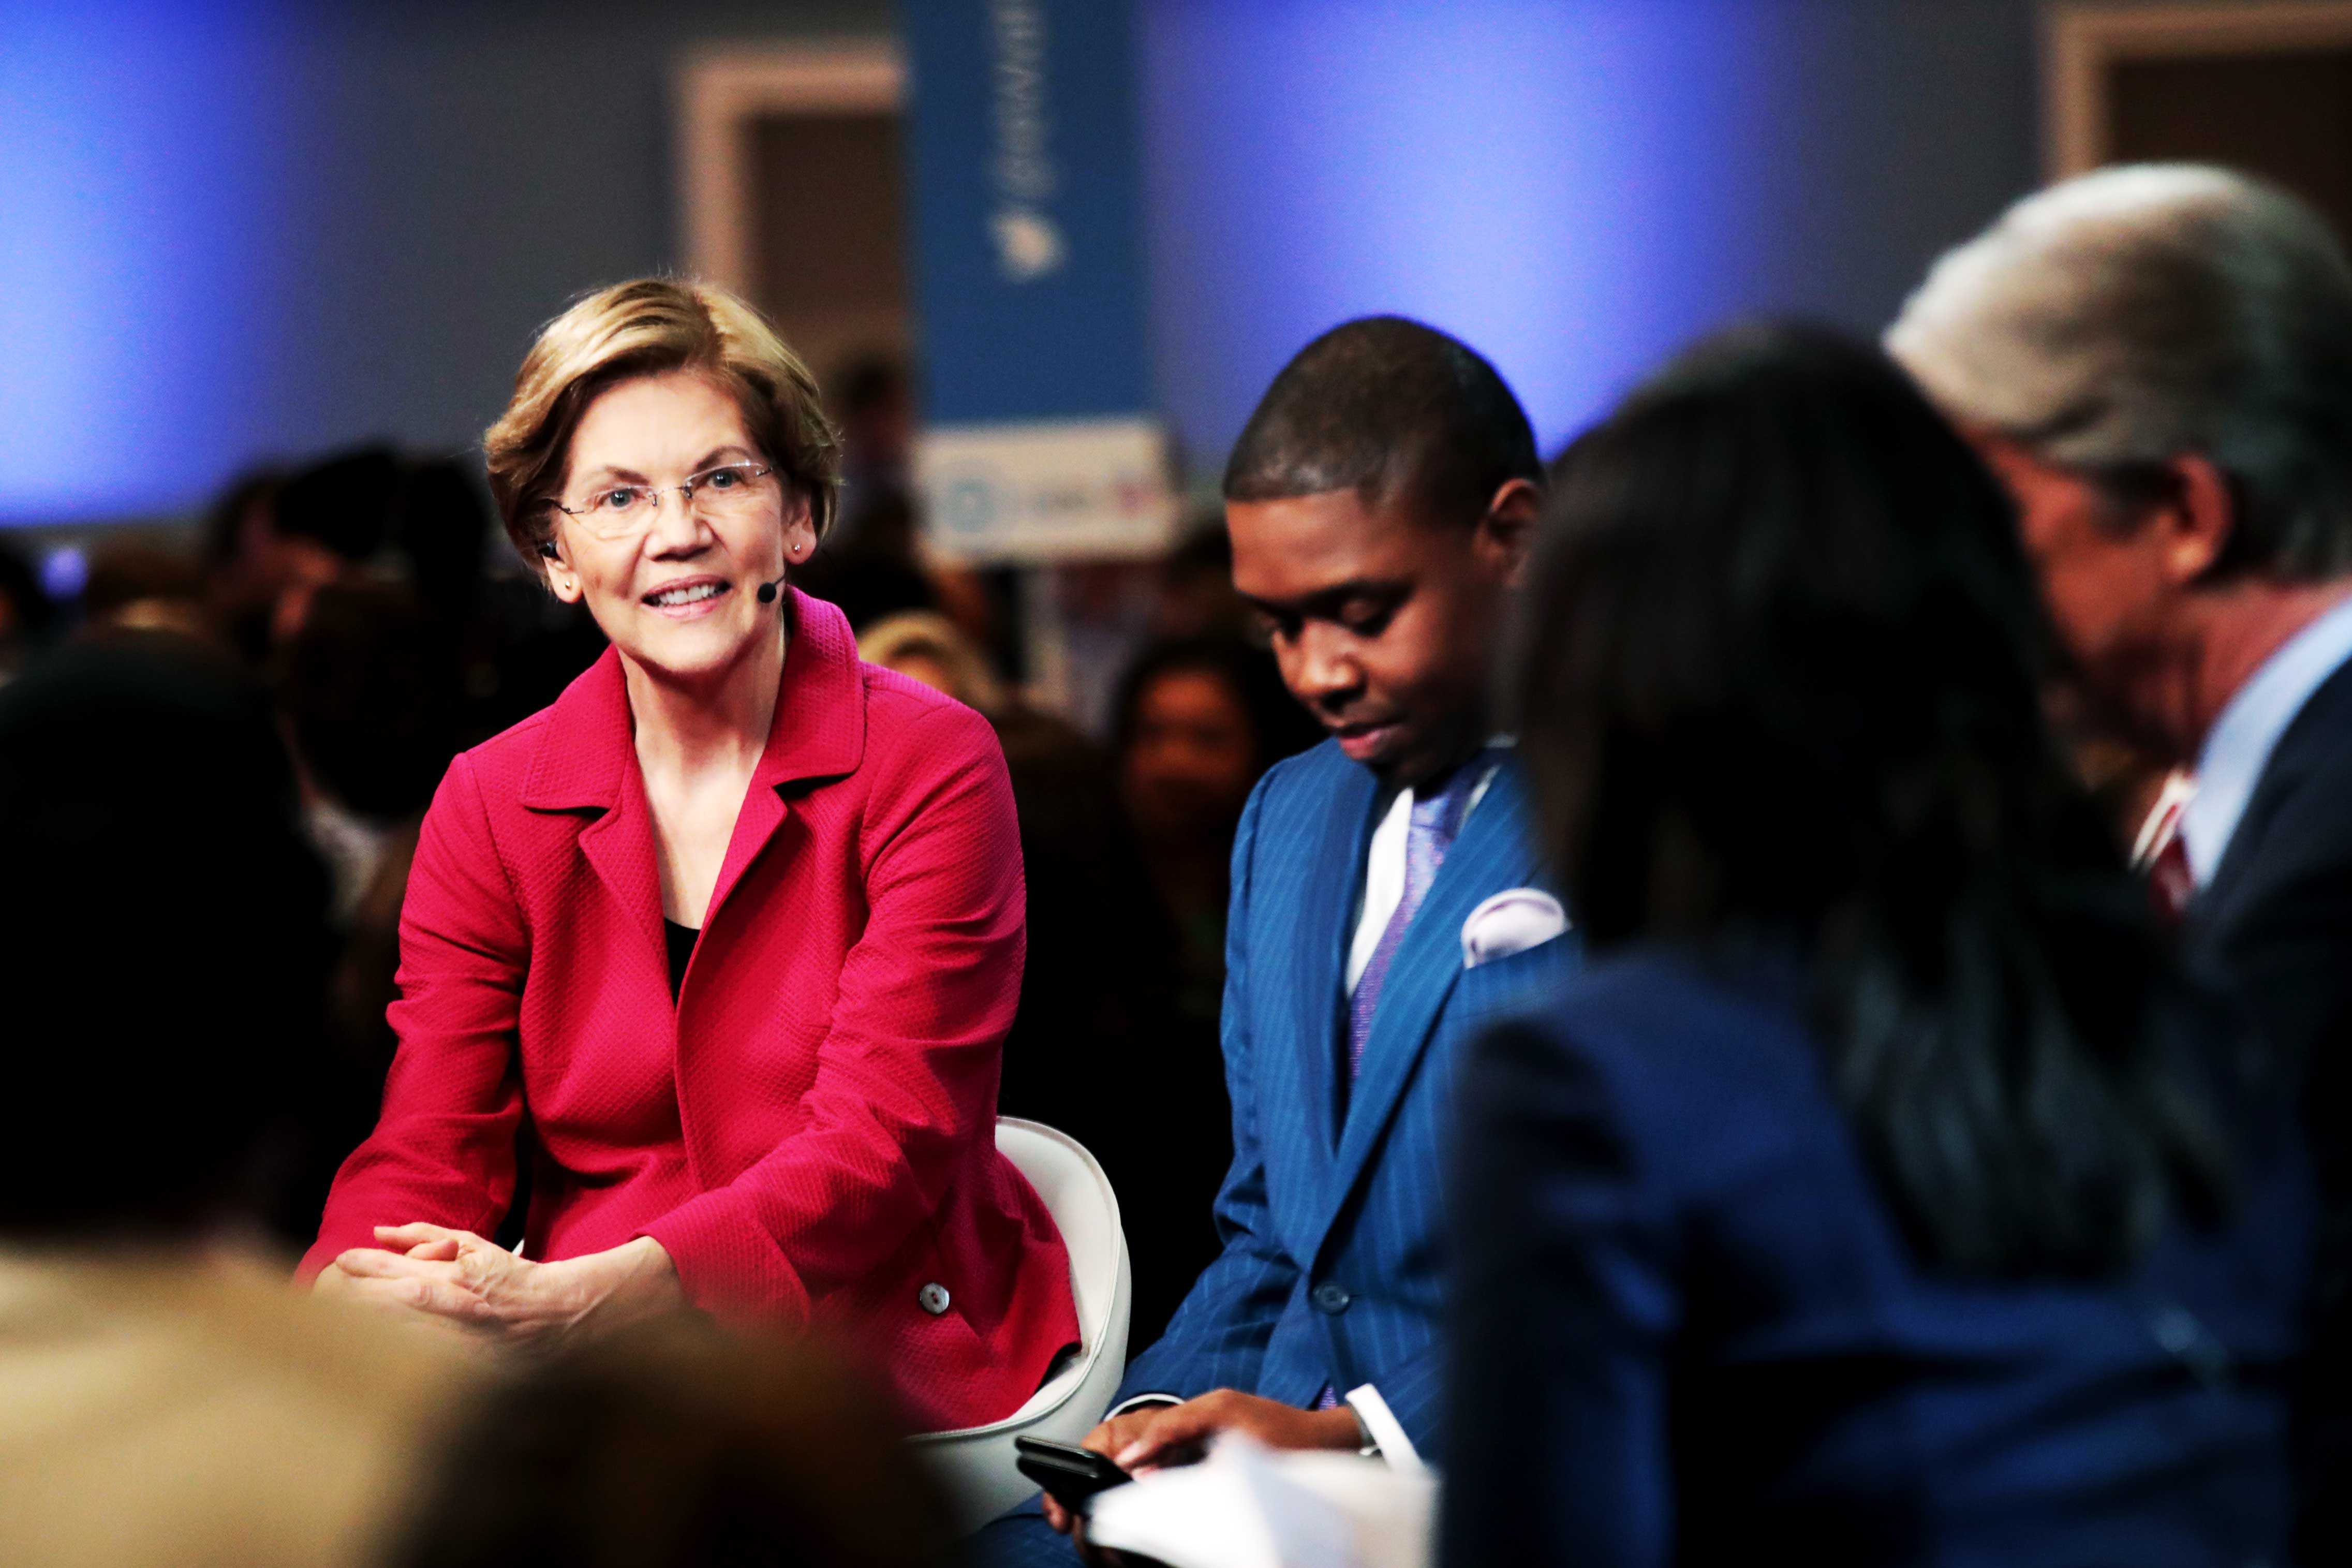 Sen. Elizabeth Warren is interviewed after the South Carolina Democratic debate February 25.